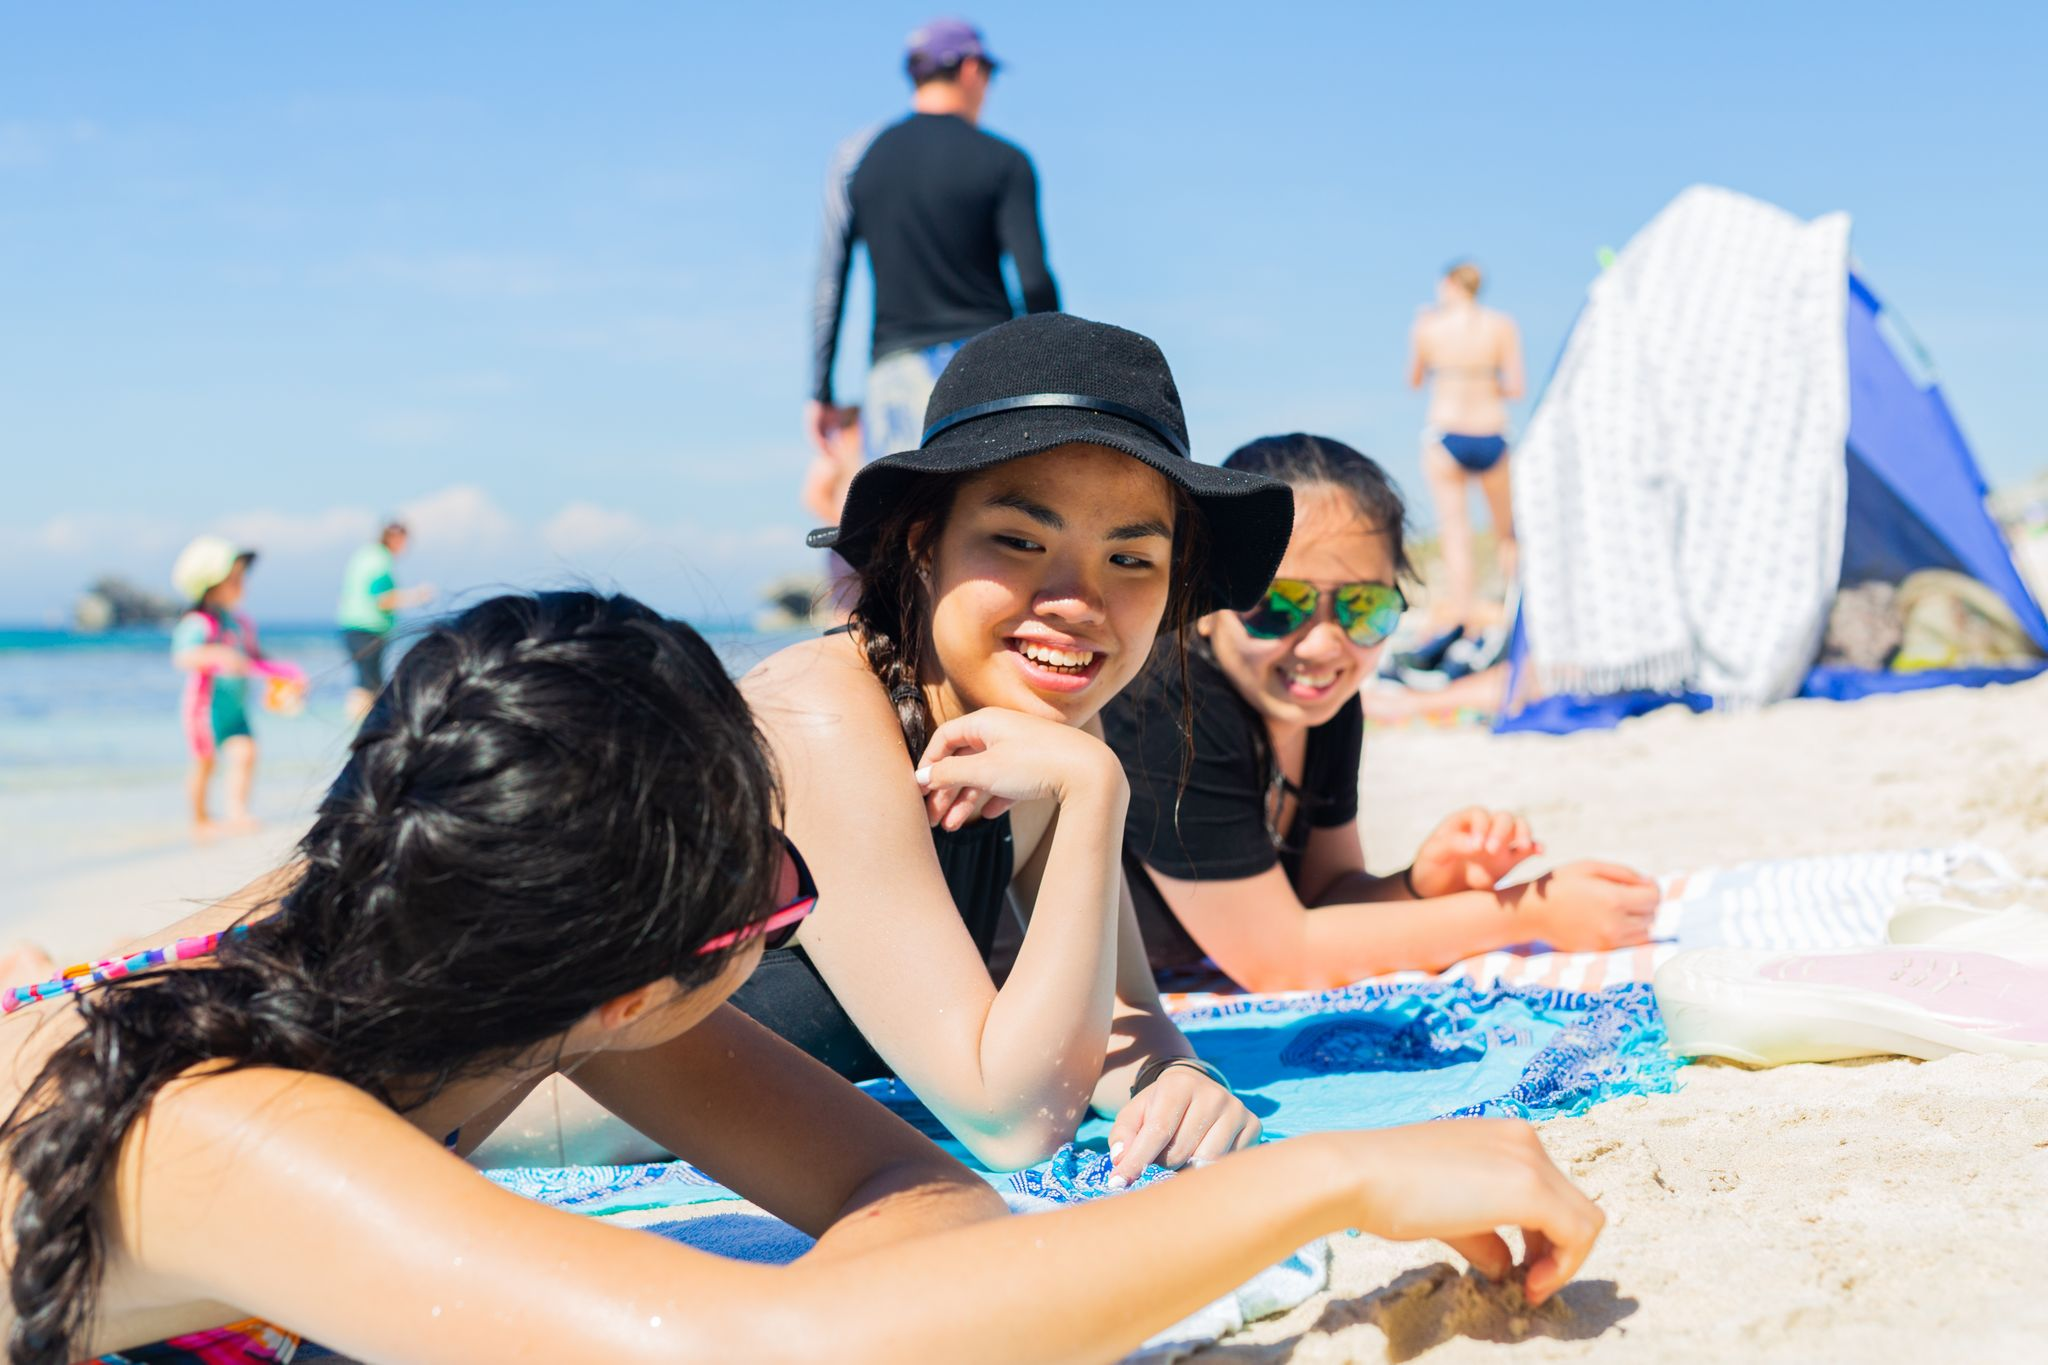 enjoying a nice day on the beach at Cottesloe Beach